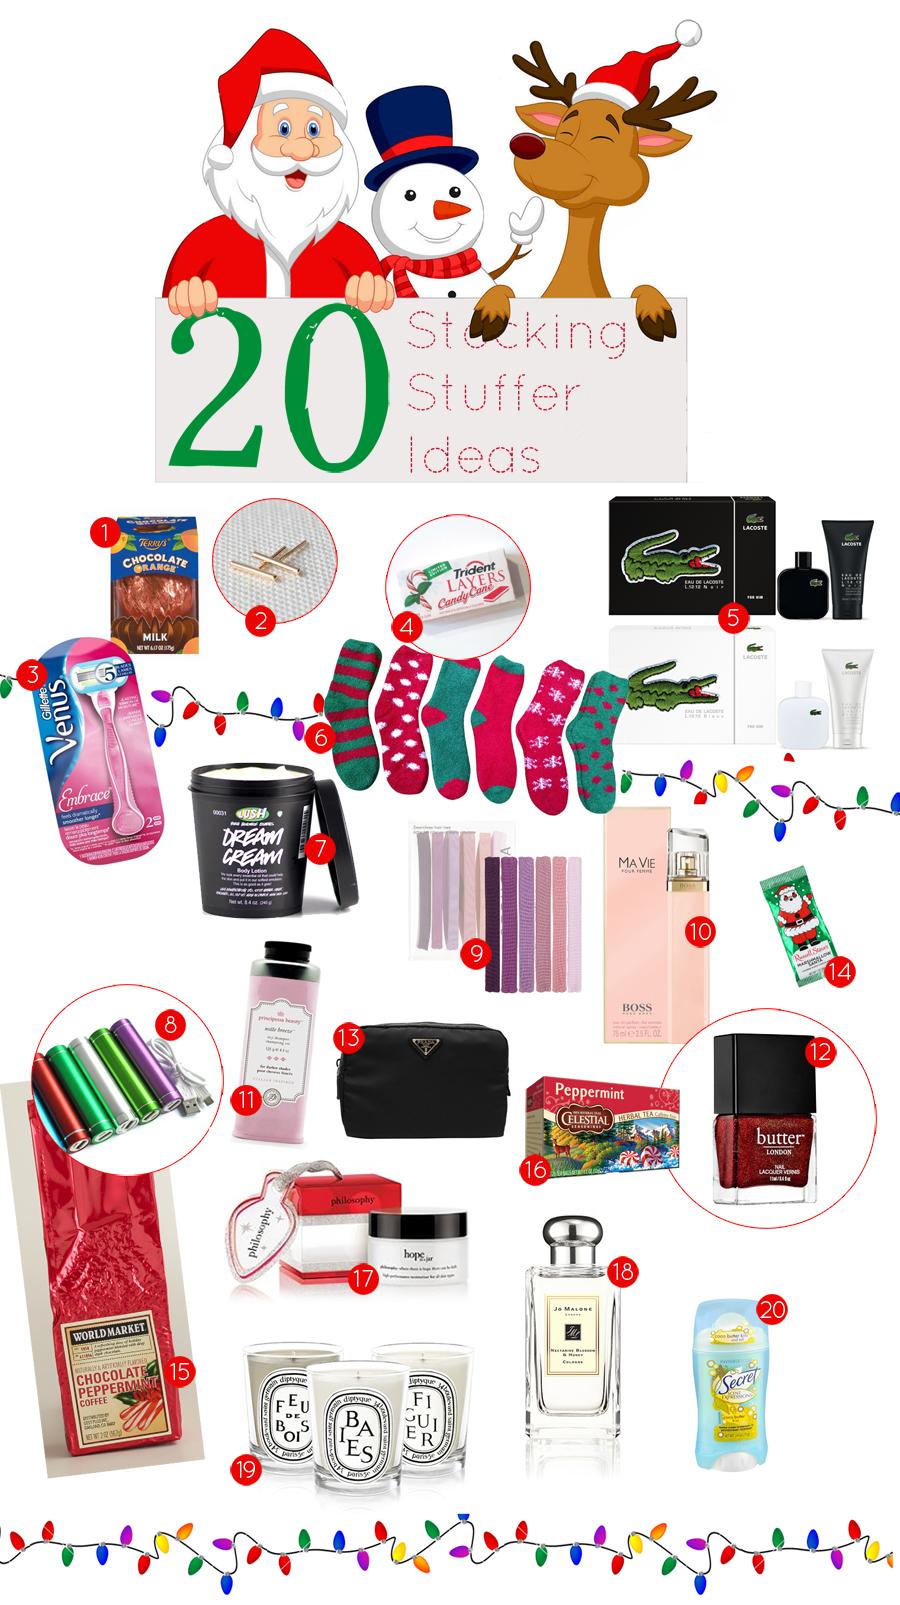 20-stocking-stuffer-ideas